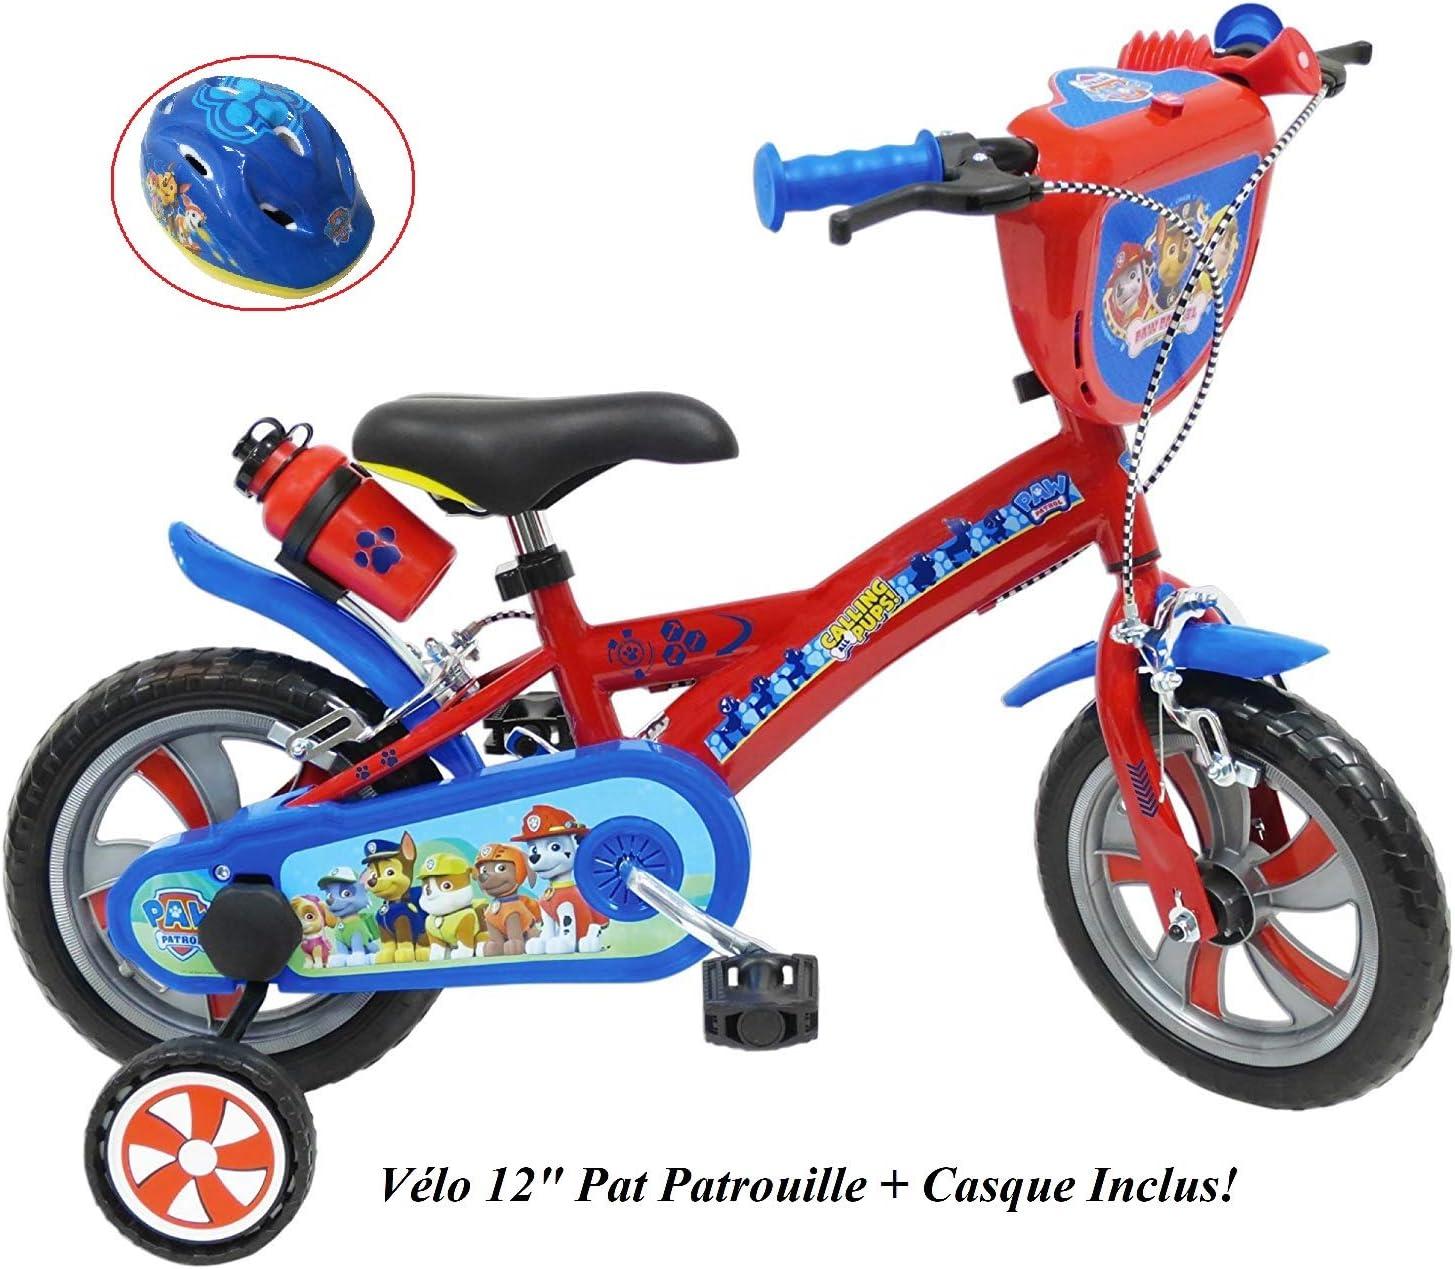 Bicicleta de 12 Pulgadas con diseño de la Patrulla Canina, 2 Frenos PB+BIDON AR + Casco Infantil, Multicolor